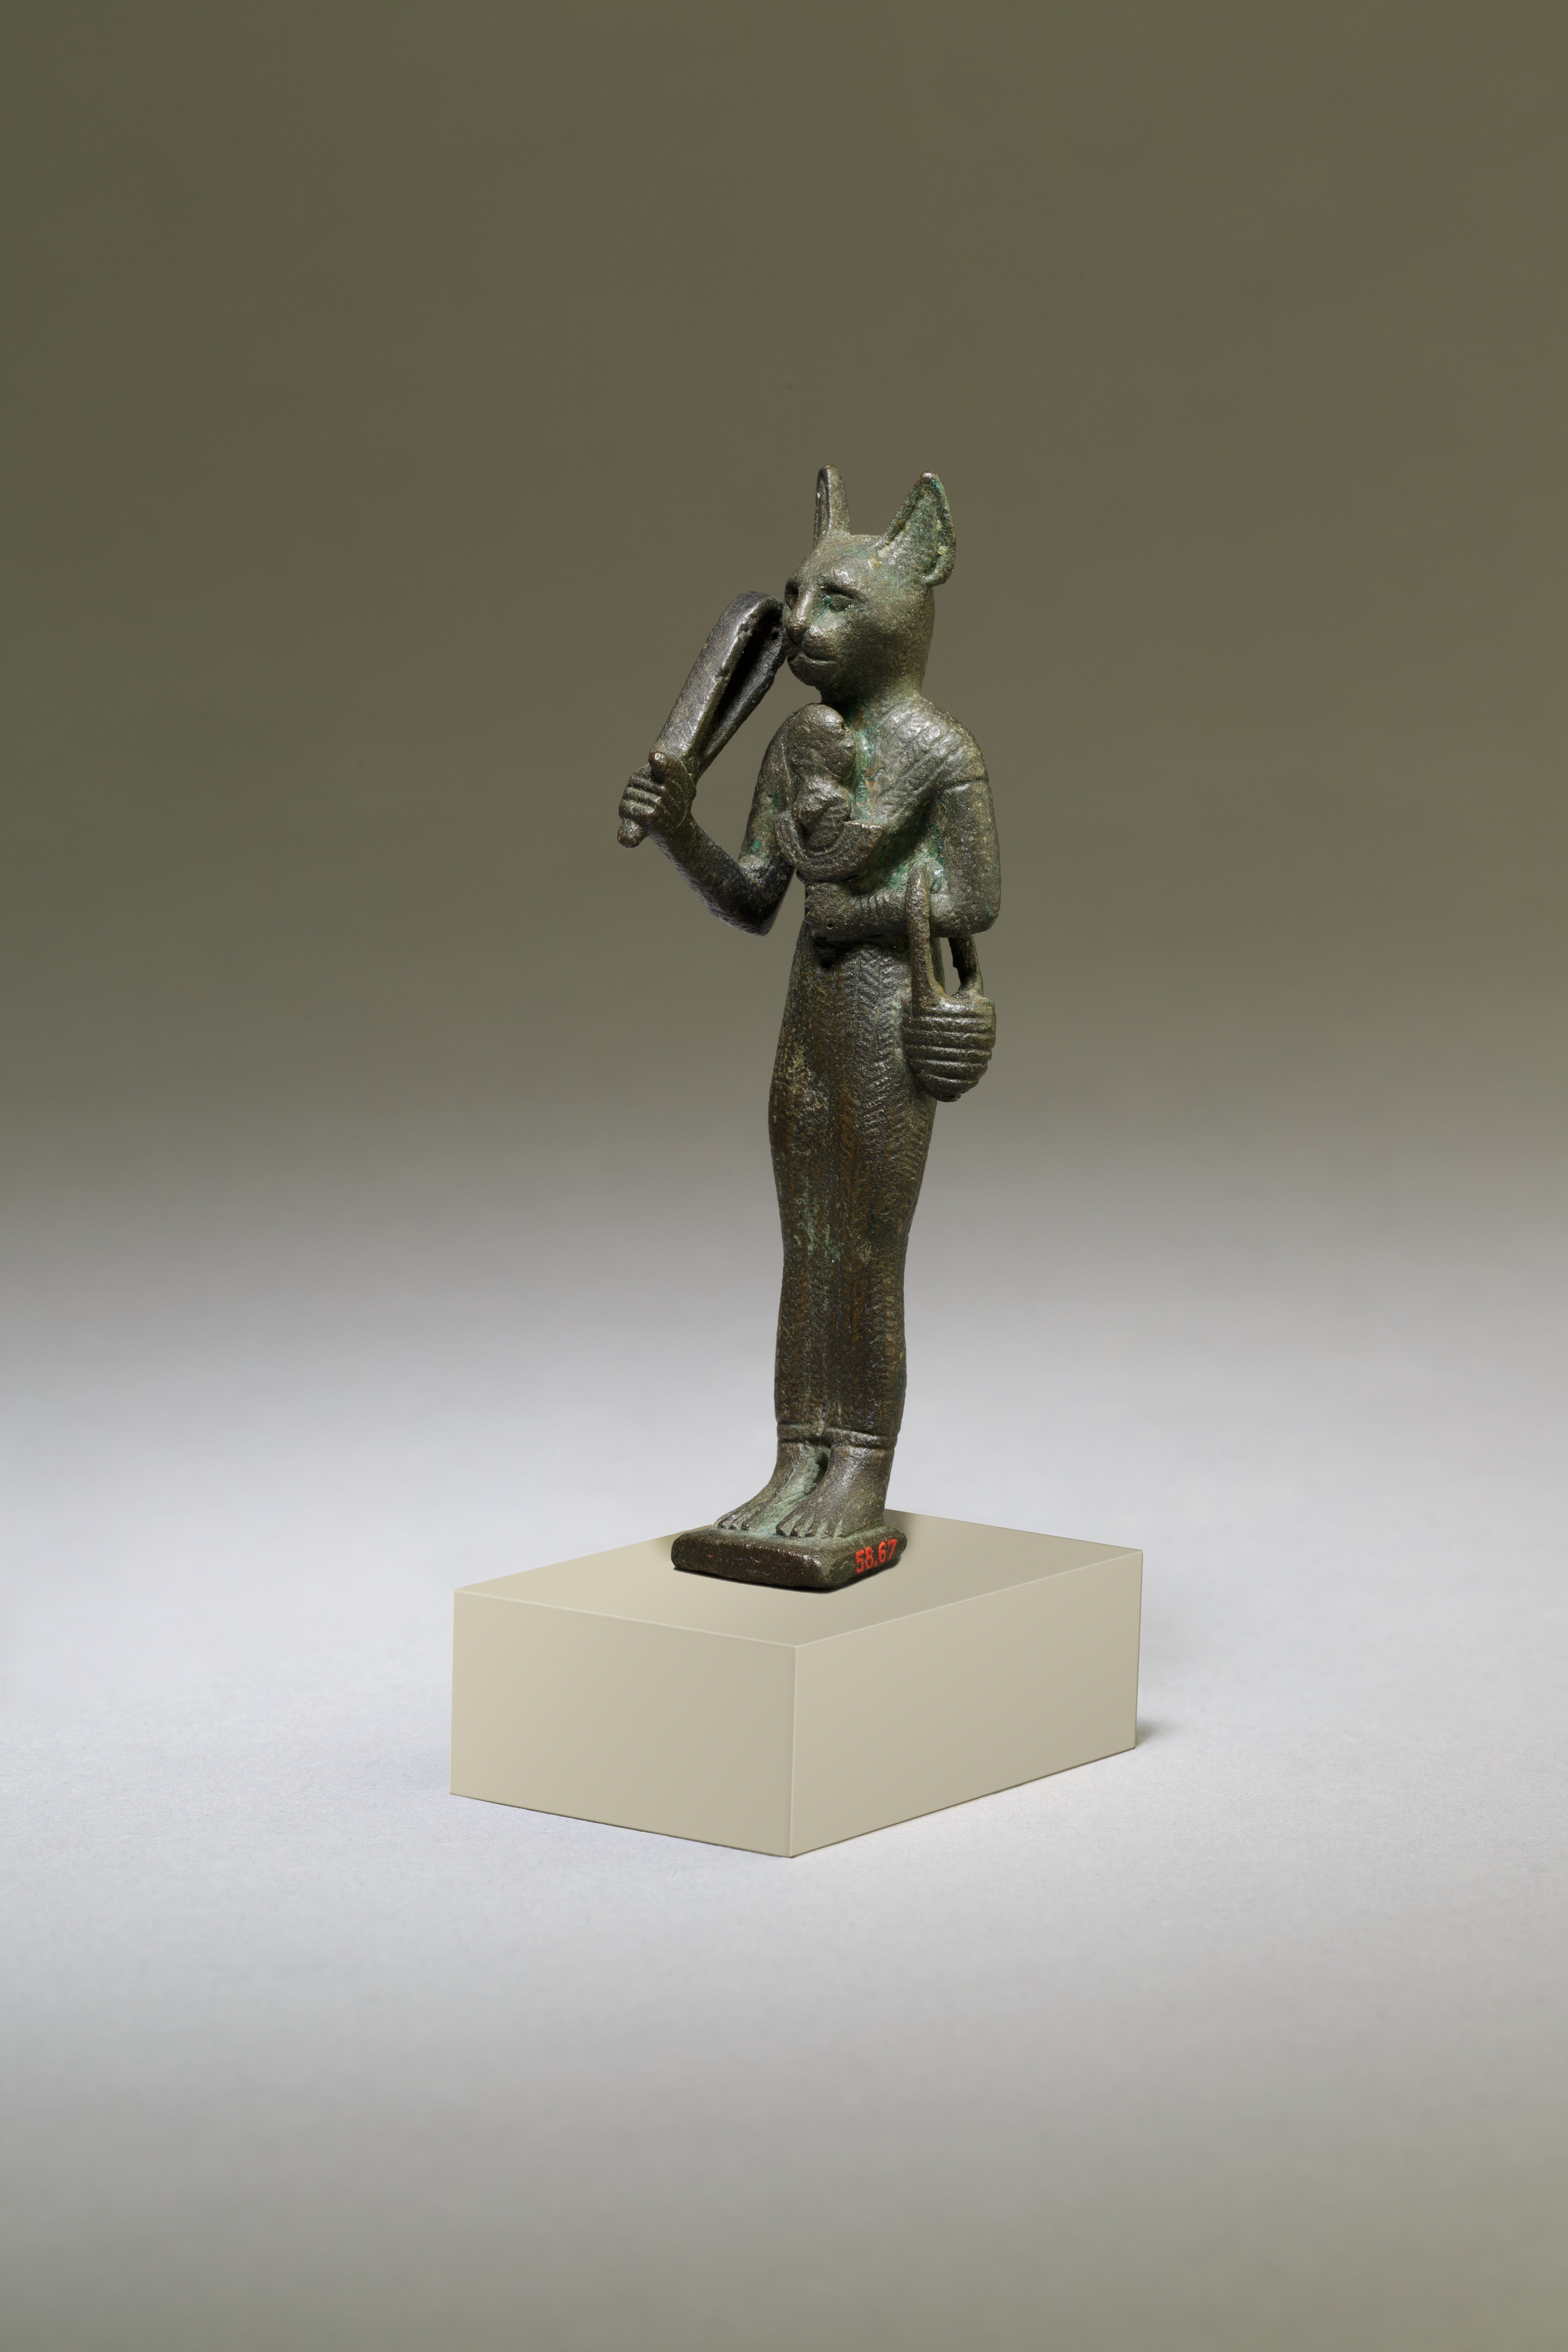 Curpreous metal figure of the Egyptian cat goddess Bastet.